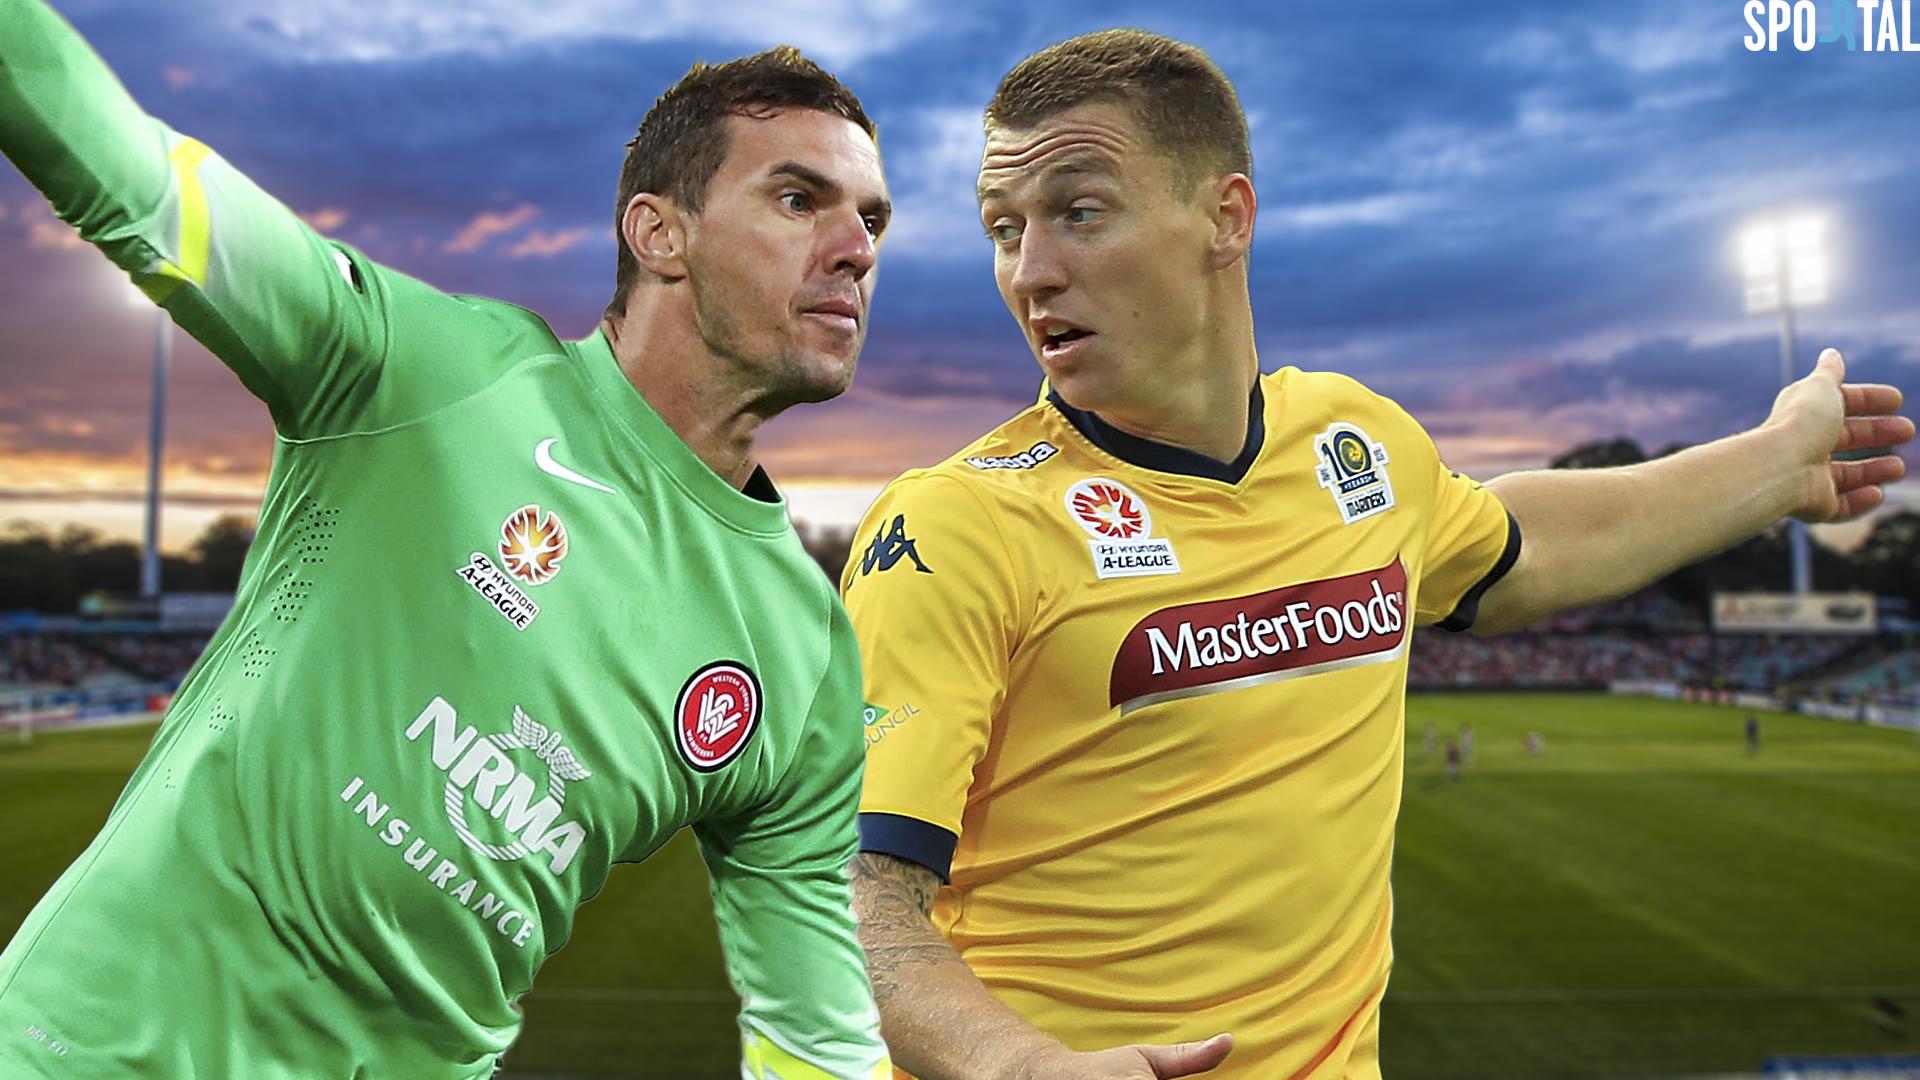 A-League. Western Sydney Wanderers v Central Coast Mariners